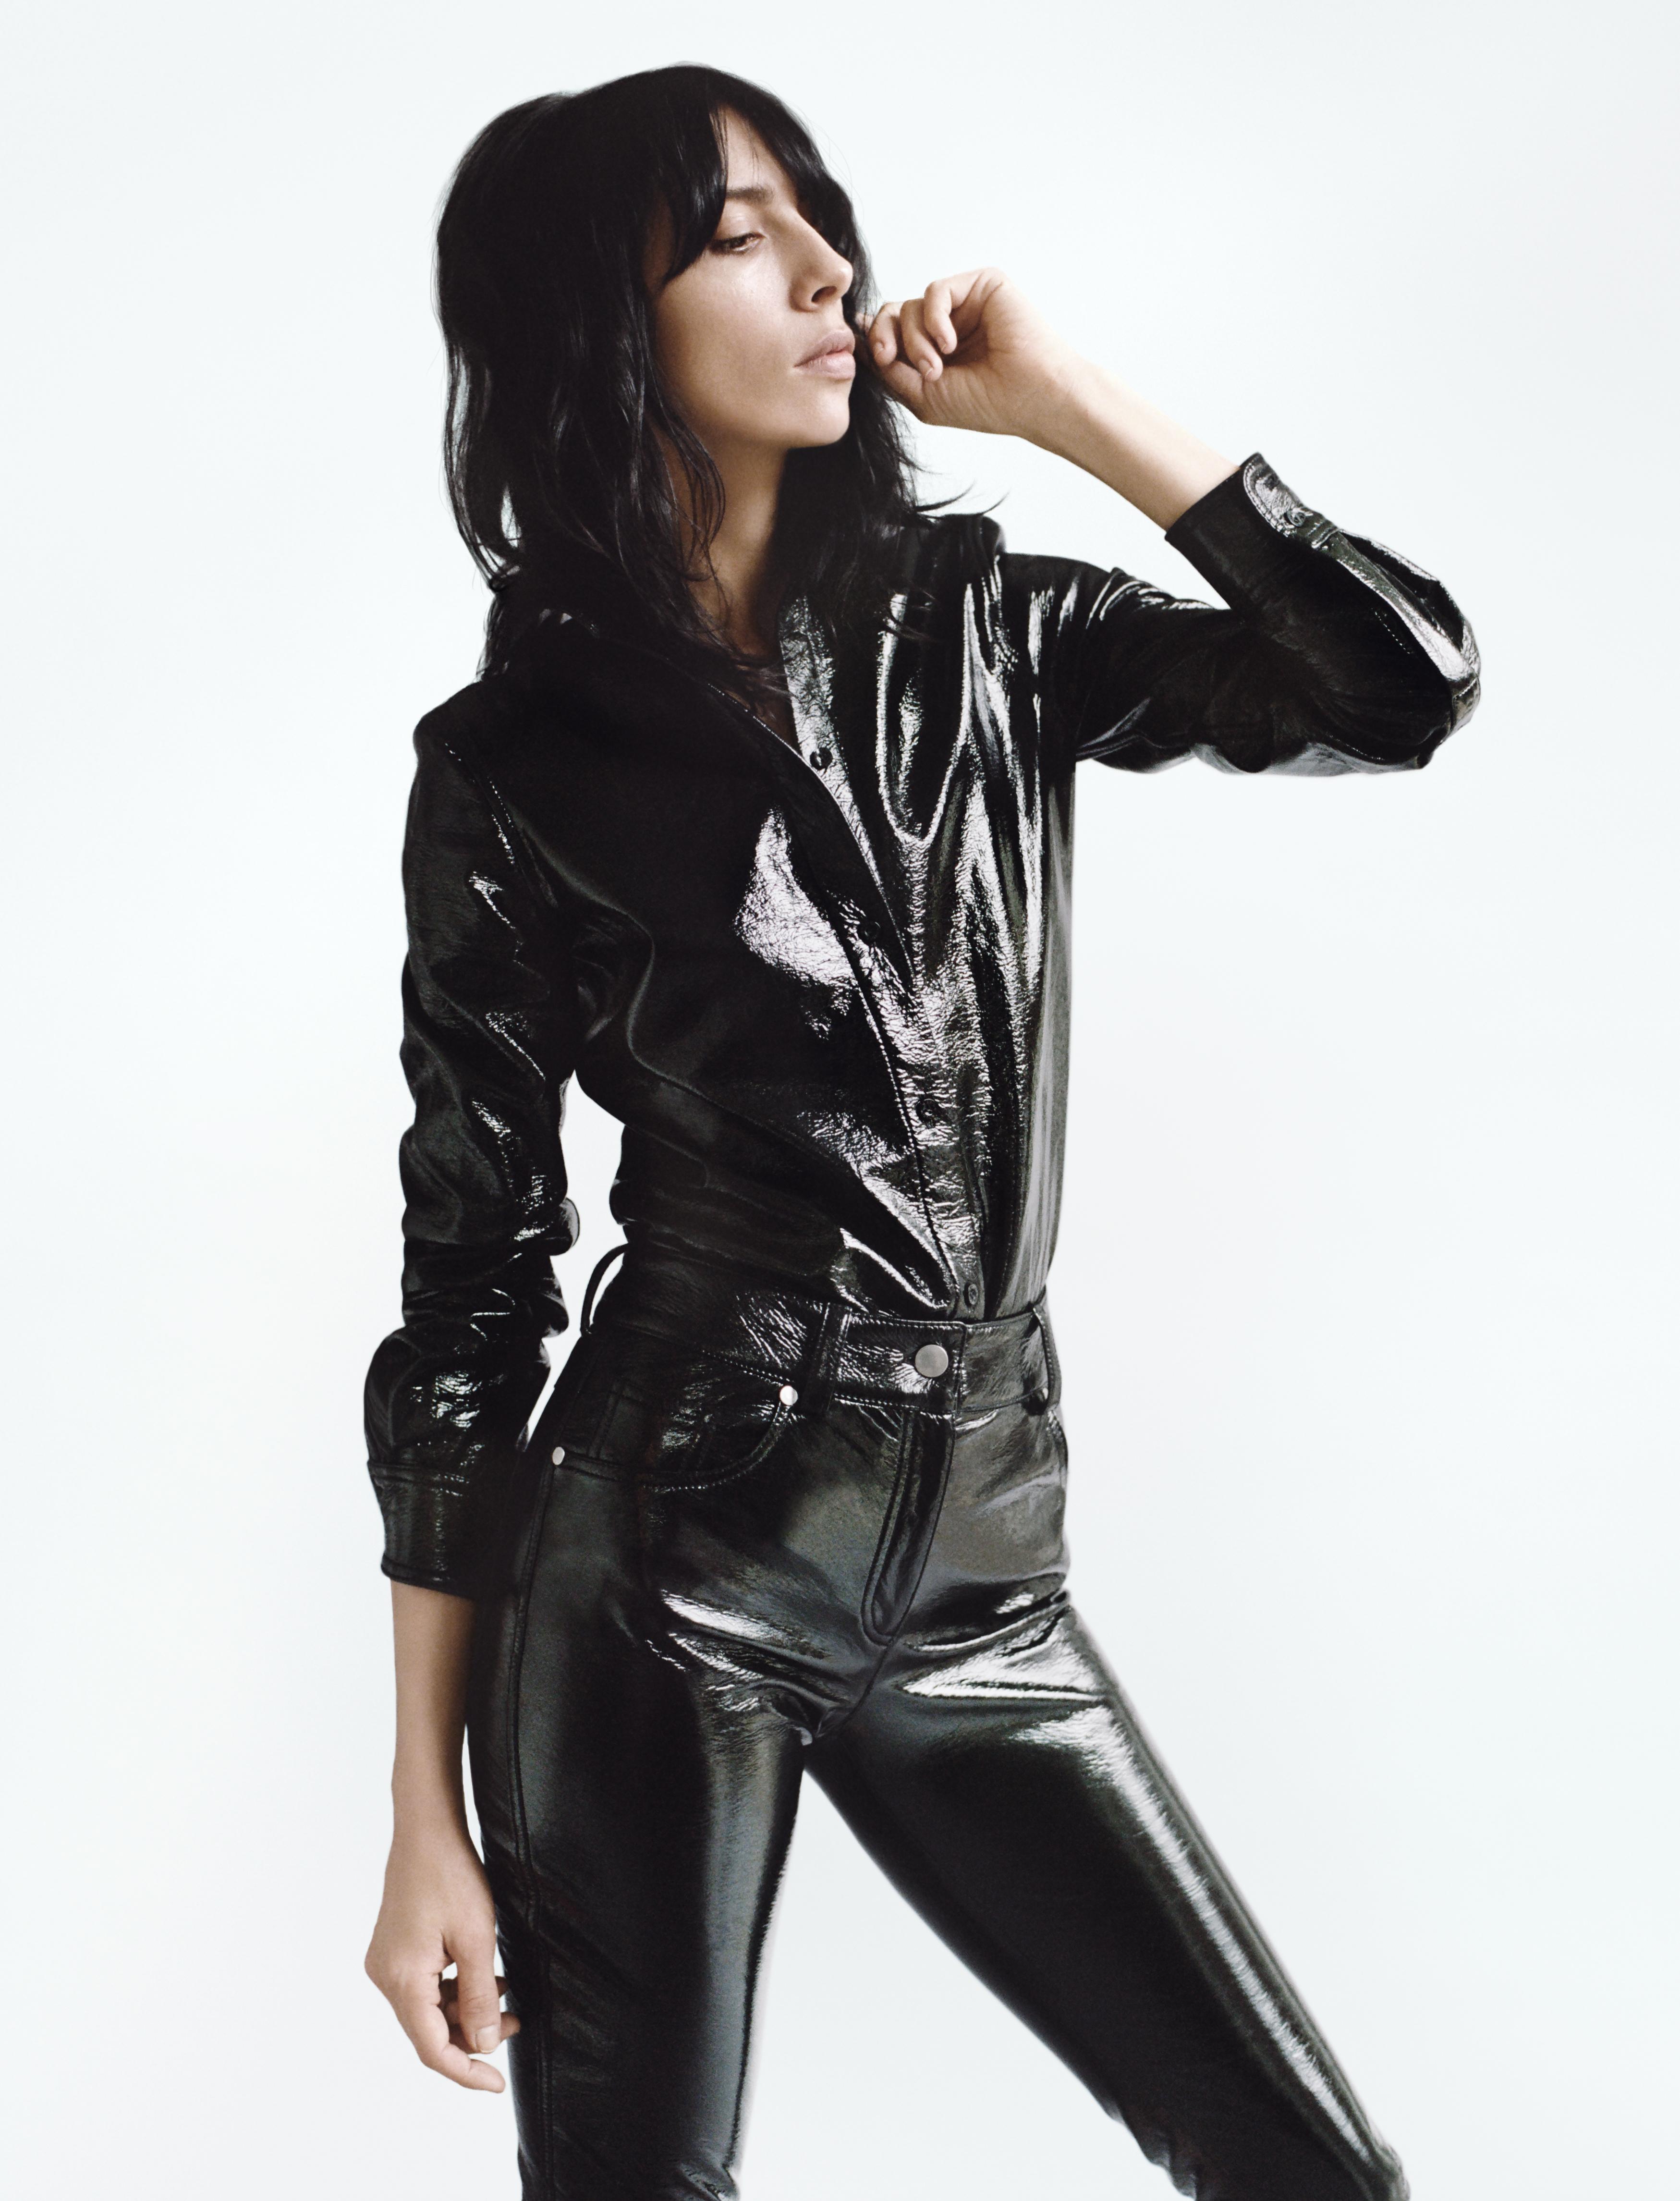 Wanda Nylon X La Redoute Capsule Collection Crash Magazine